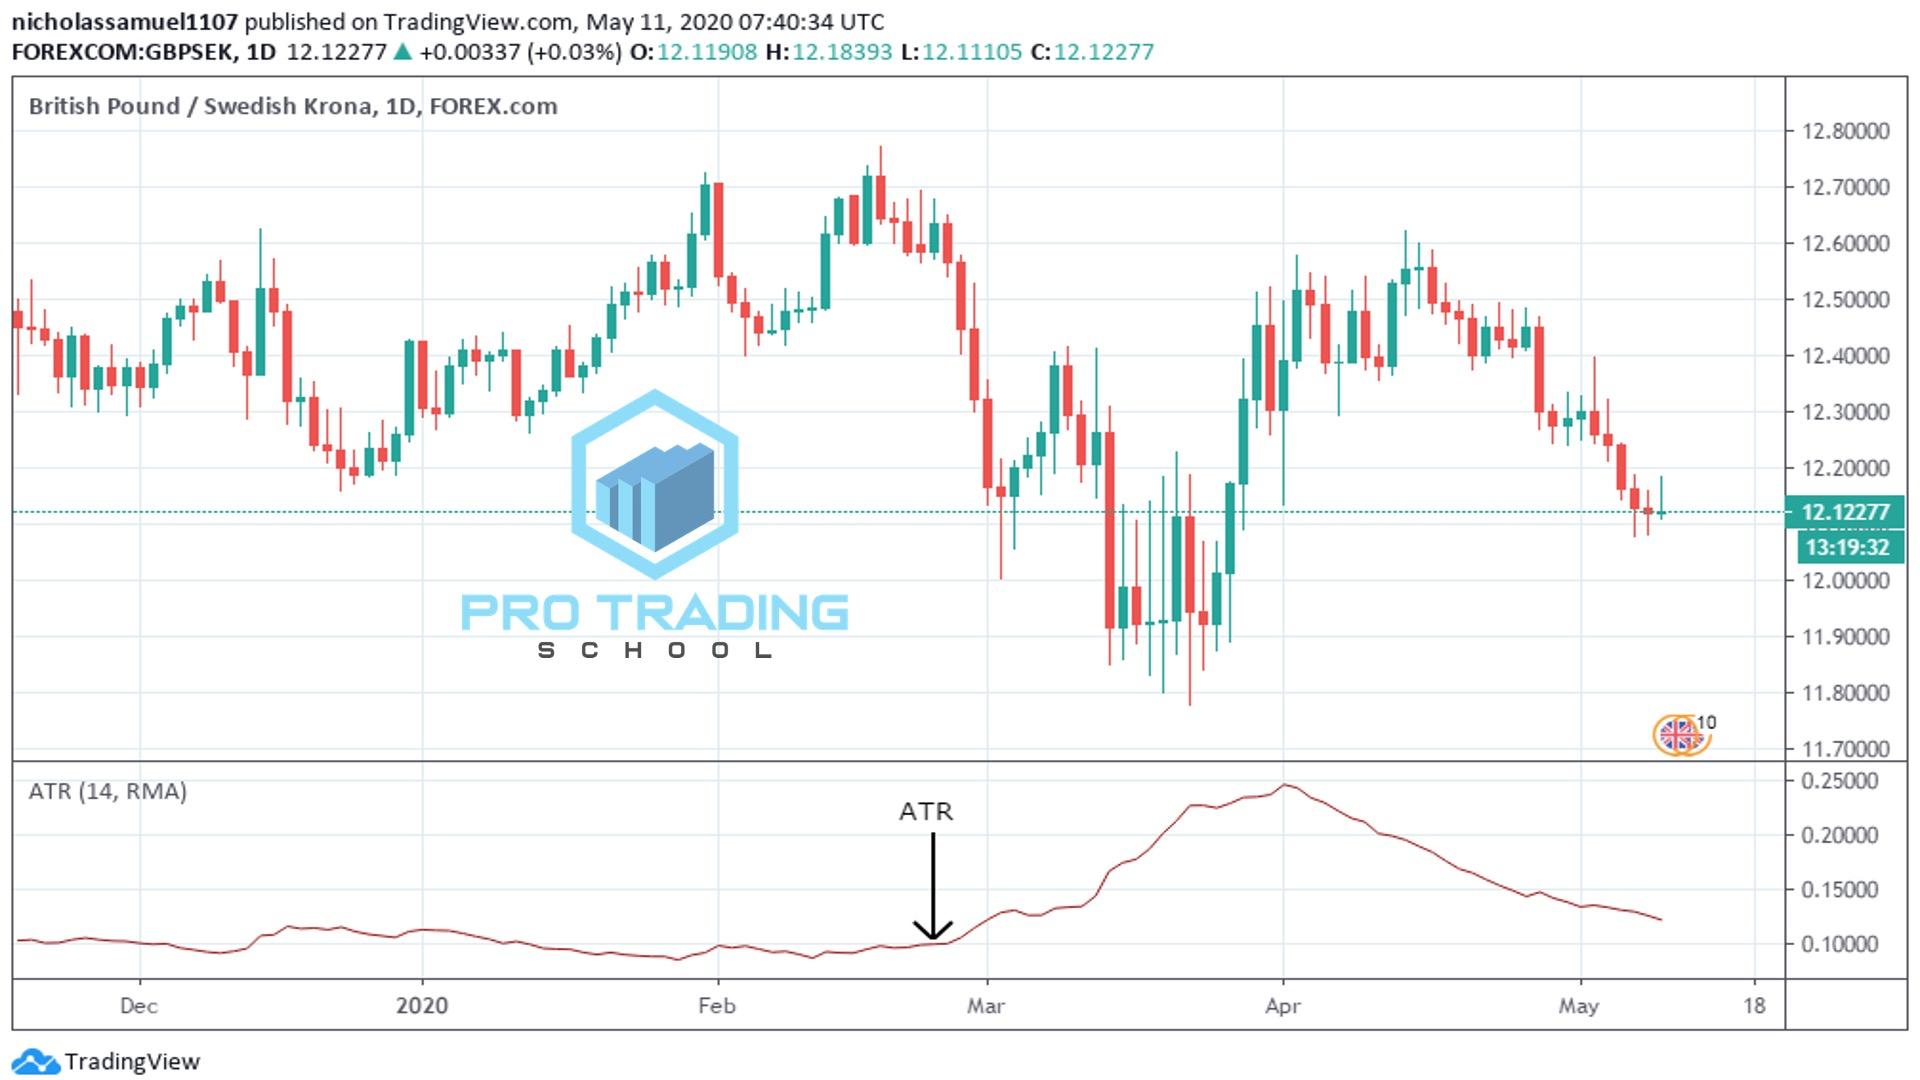 ATR-trading-strategies